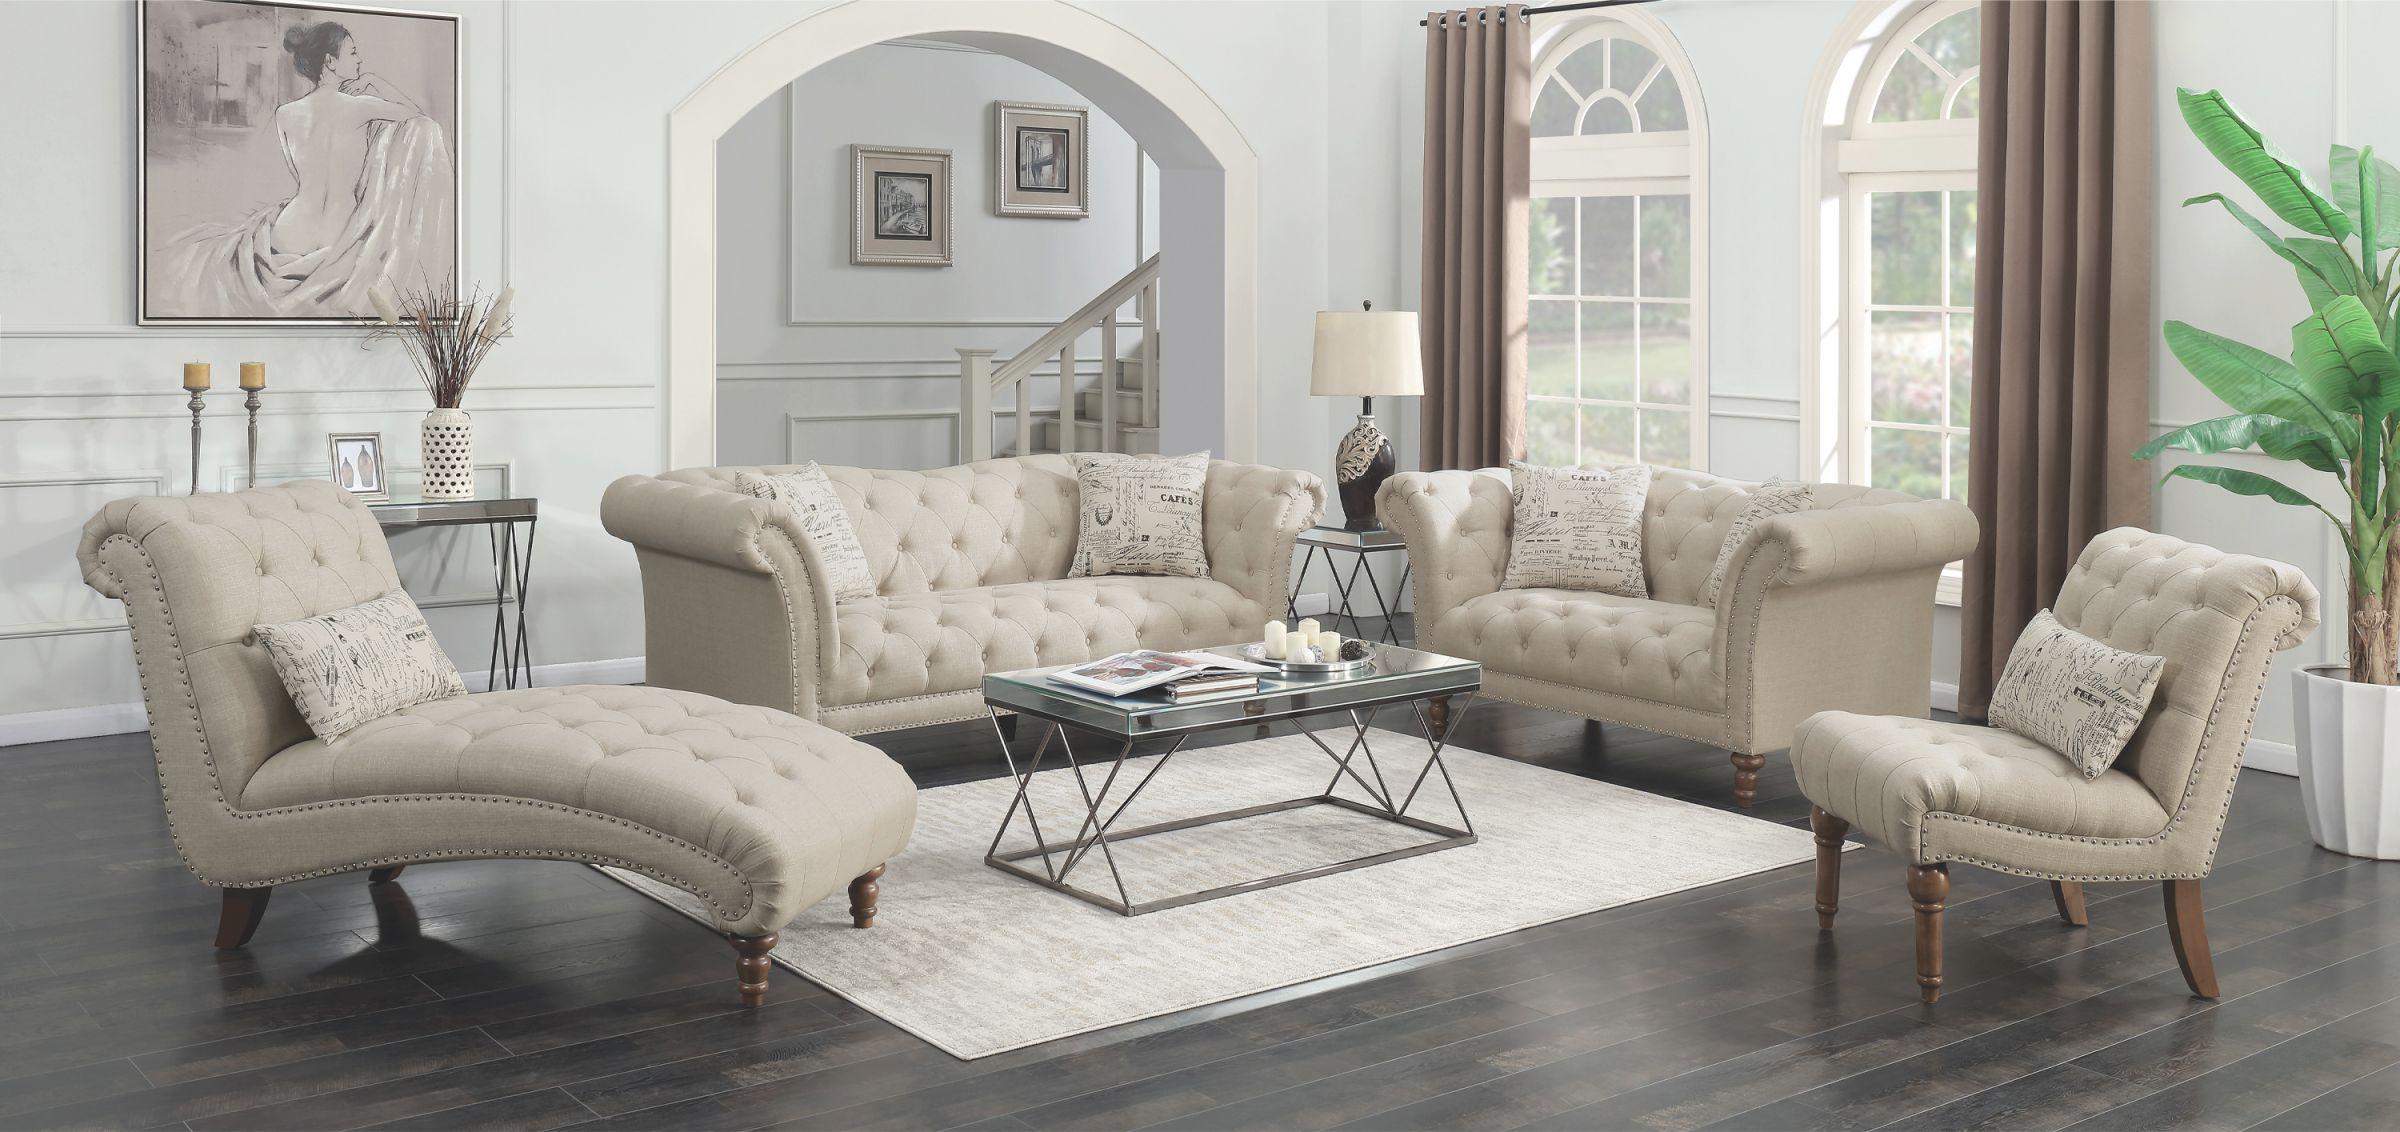 Josephine 2-Piece Tufted Living Room Set Beige – Coaster for Tufted Living Room Furniture